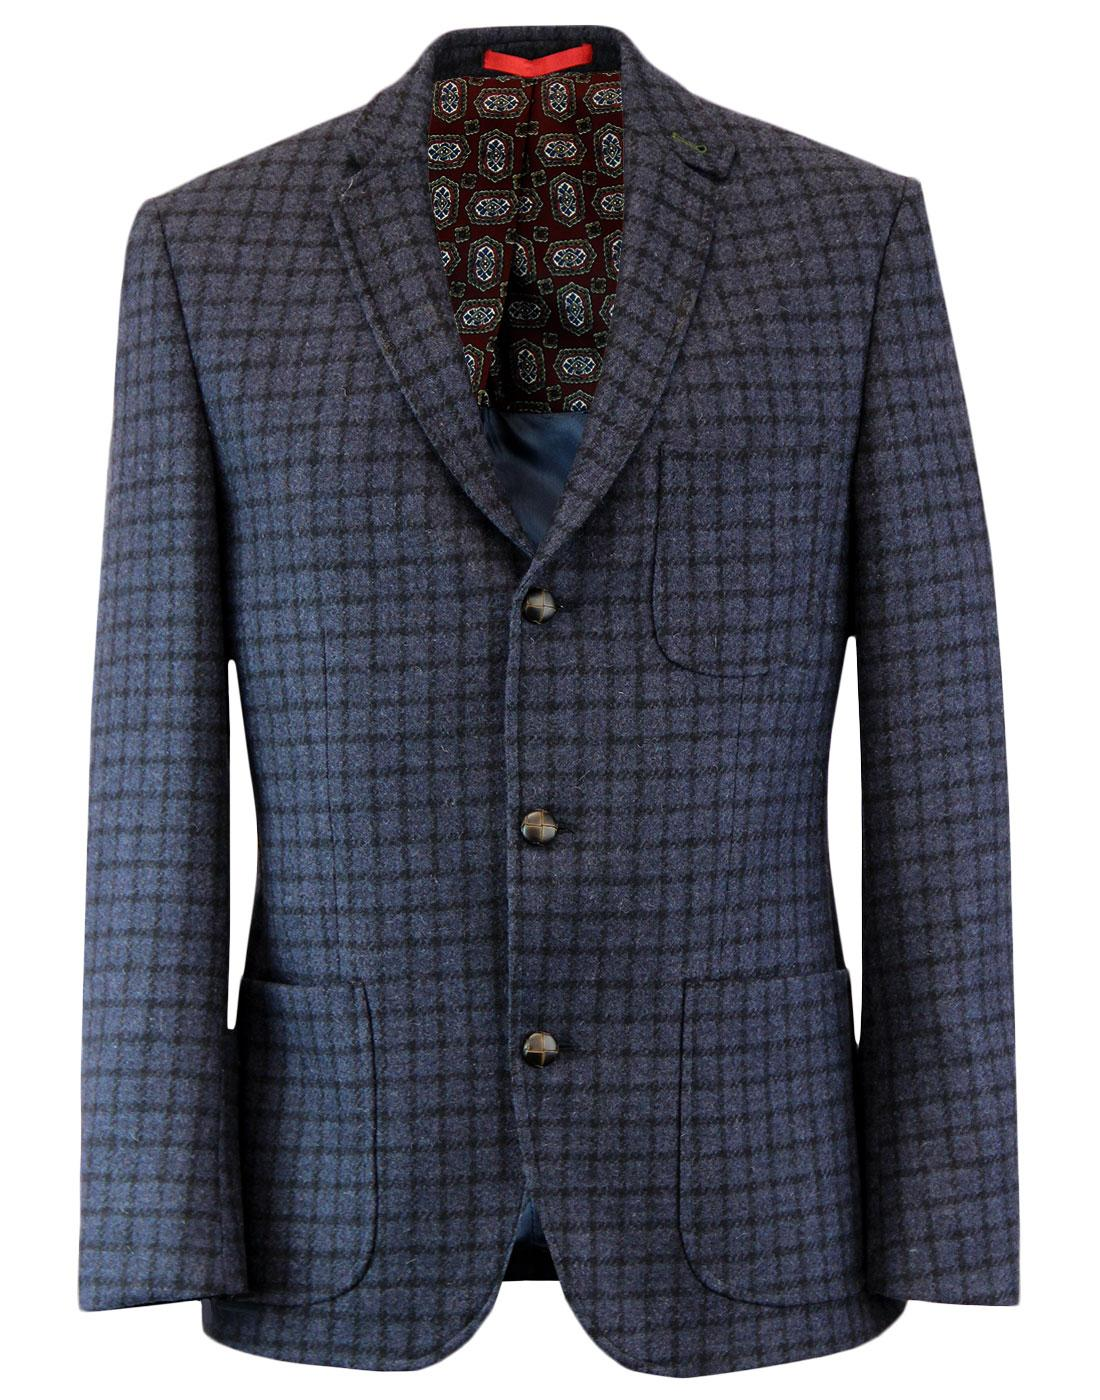 Retro Mod 3 Button Blue Tweed Check Blazer Jacket